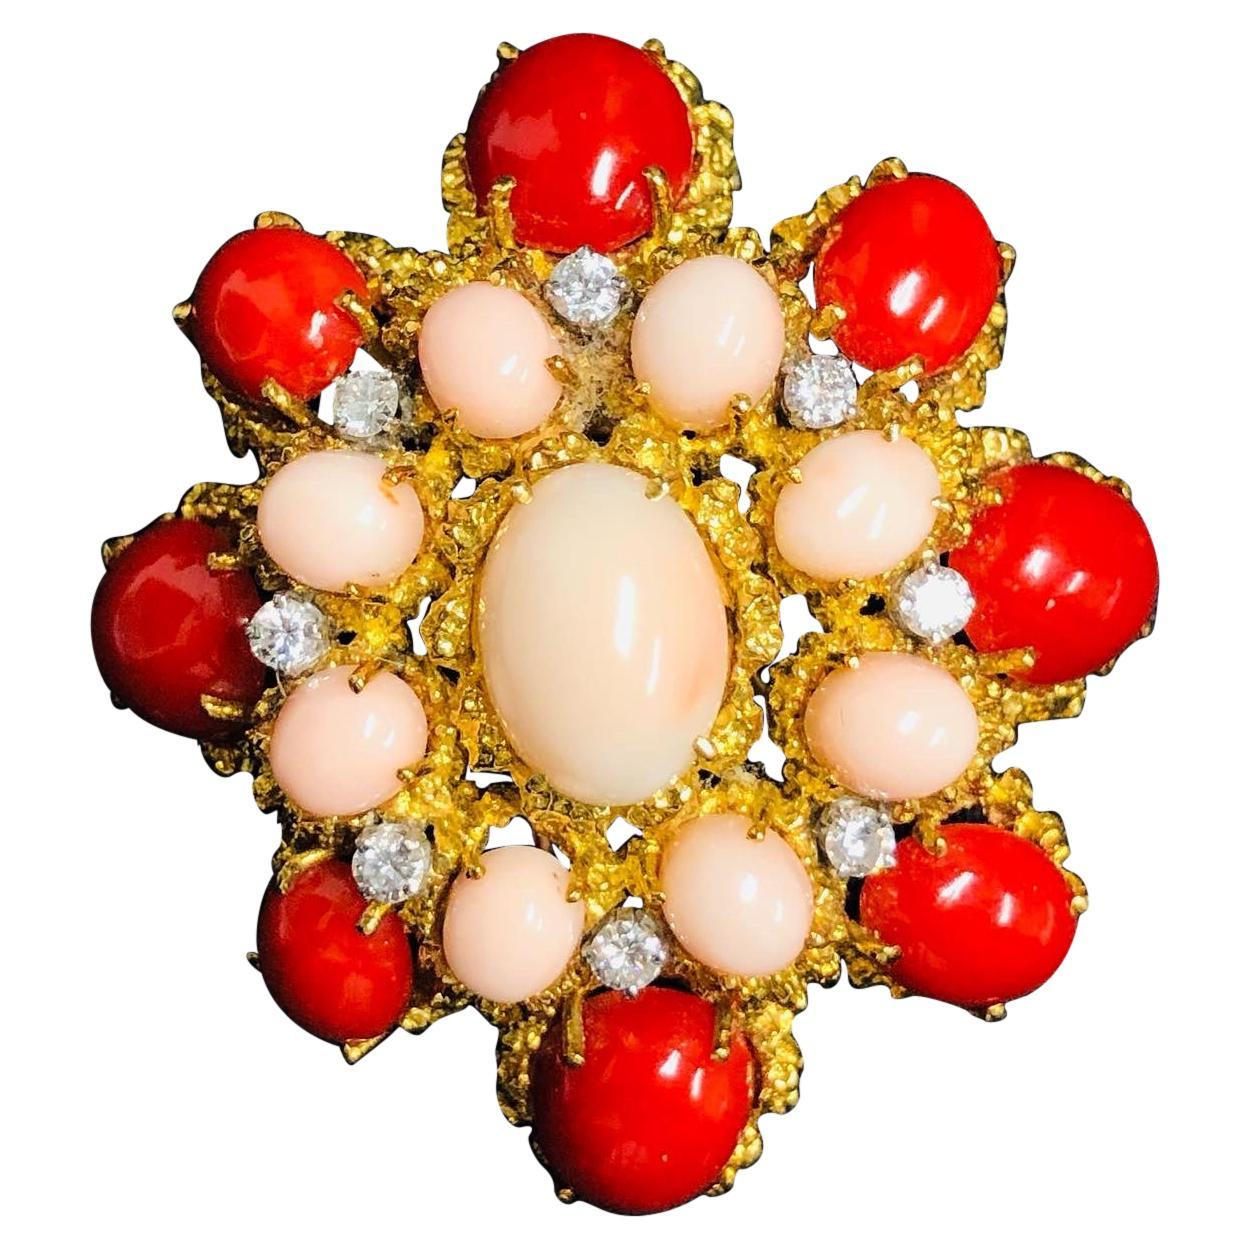 Van Cleef & Arpels Vintage French 1960 Coral and Diamond Clip Brooch